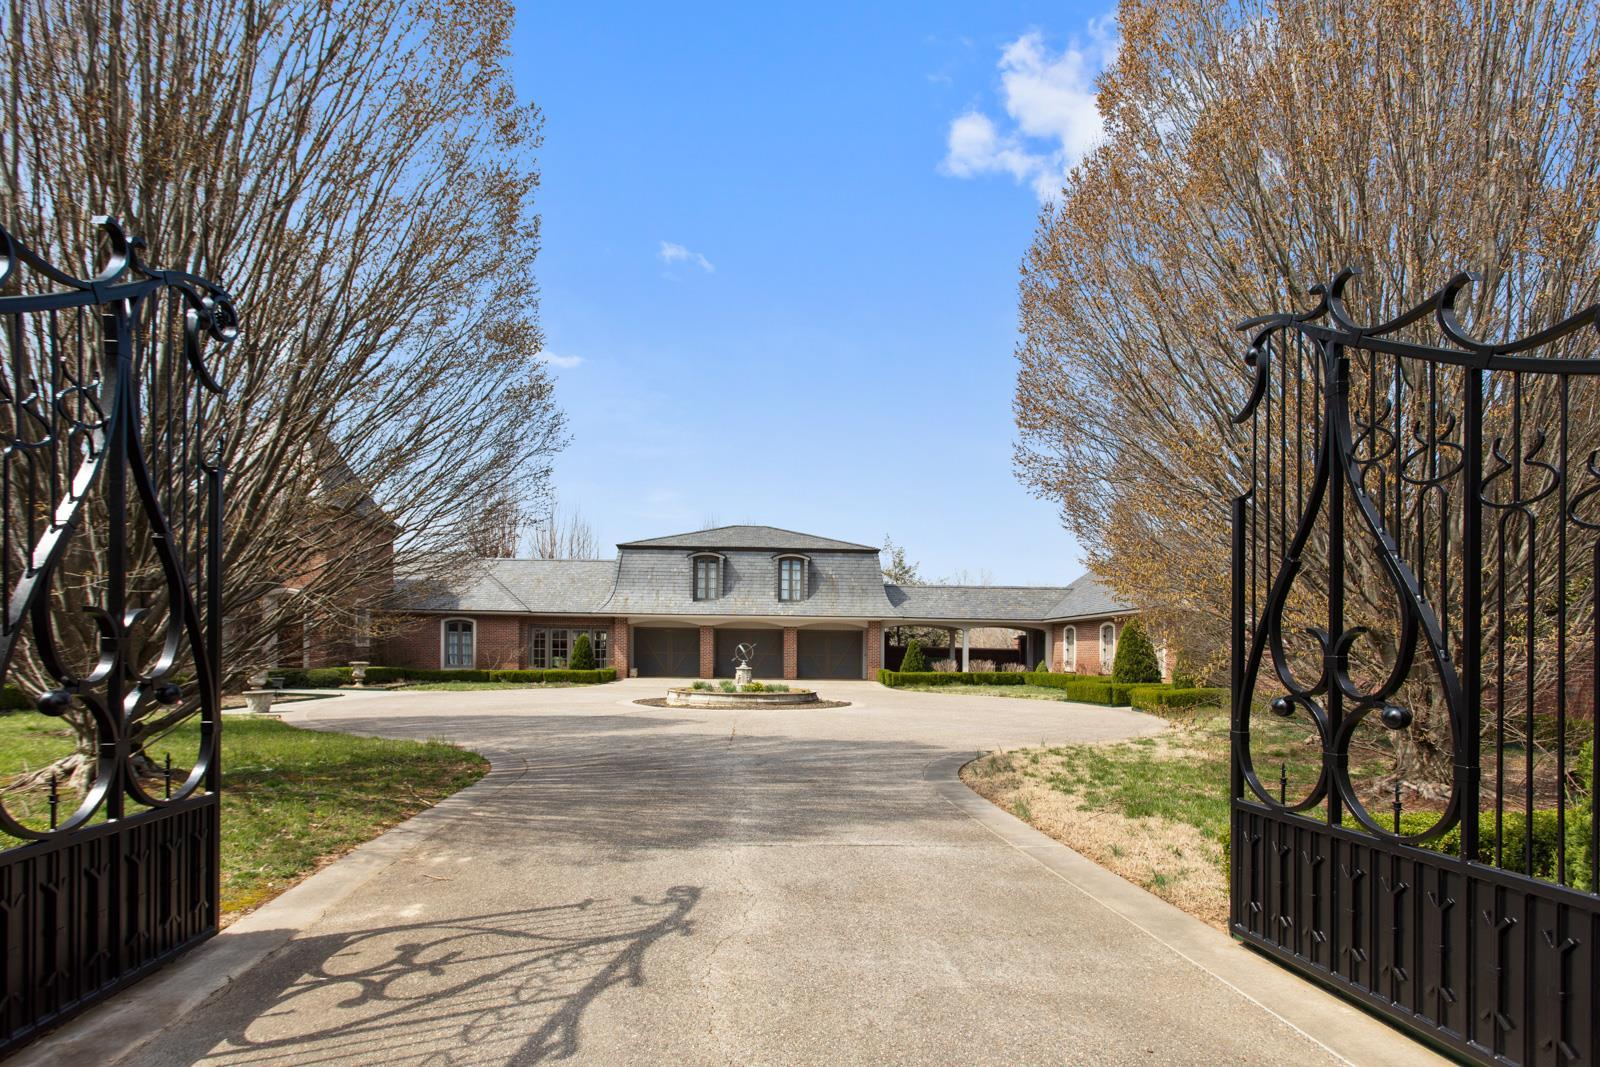 $5,300,000 - 4Br/5Ba -  for Sale in Roger Blackwood Survey, Springfield